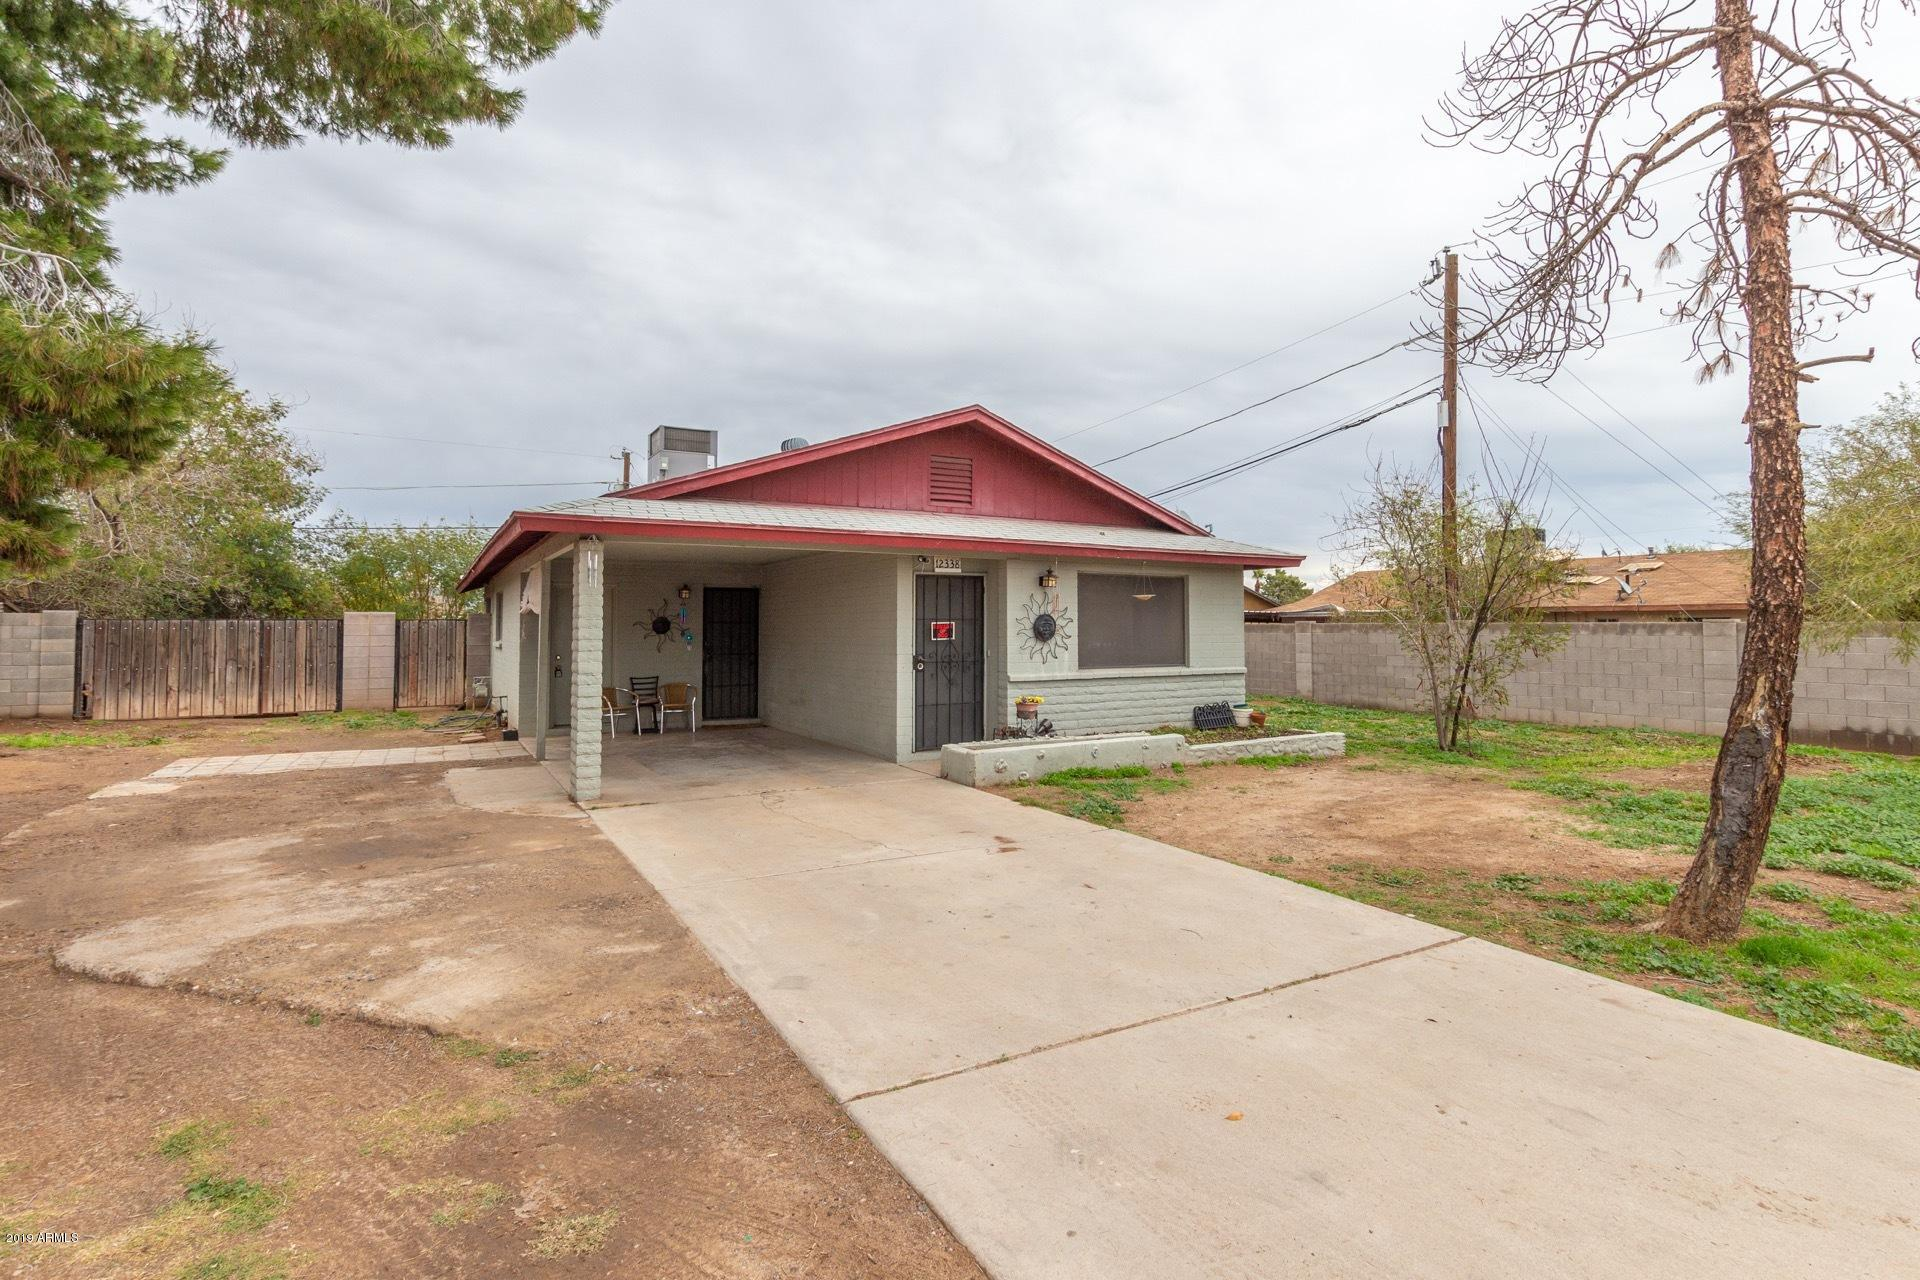 Photo of 12338 W LOWER BUCKEYE Road, Avondale, AZ 85323